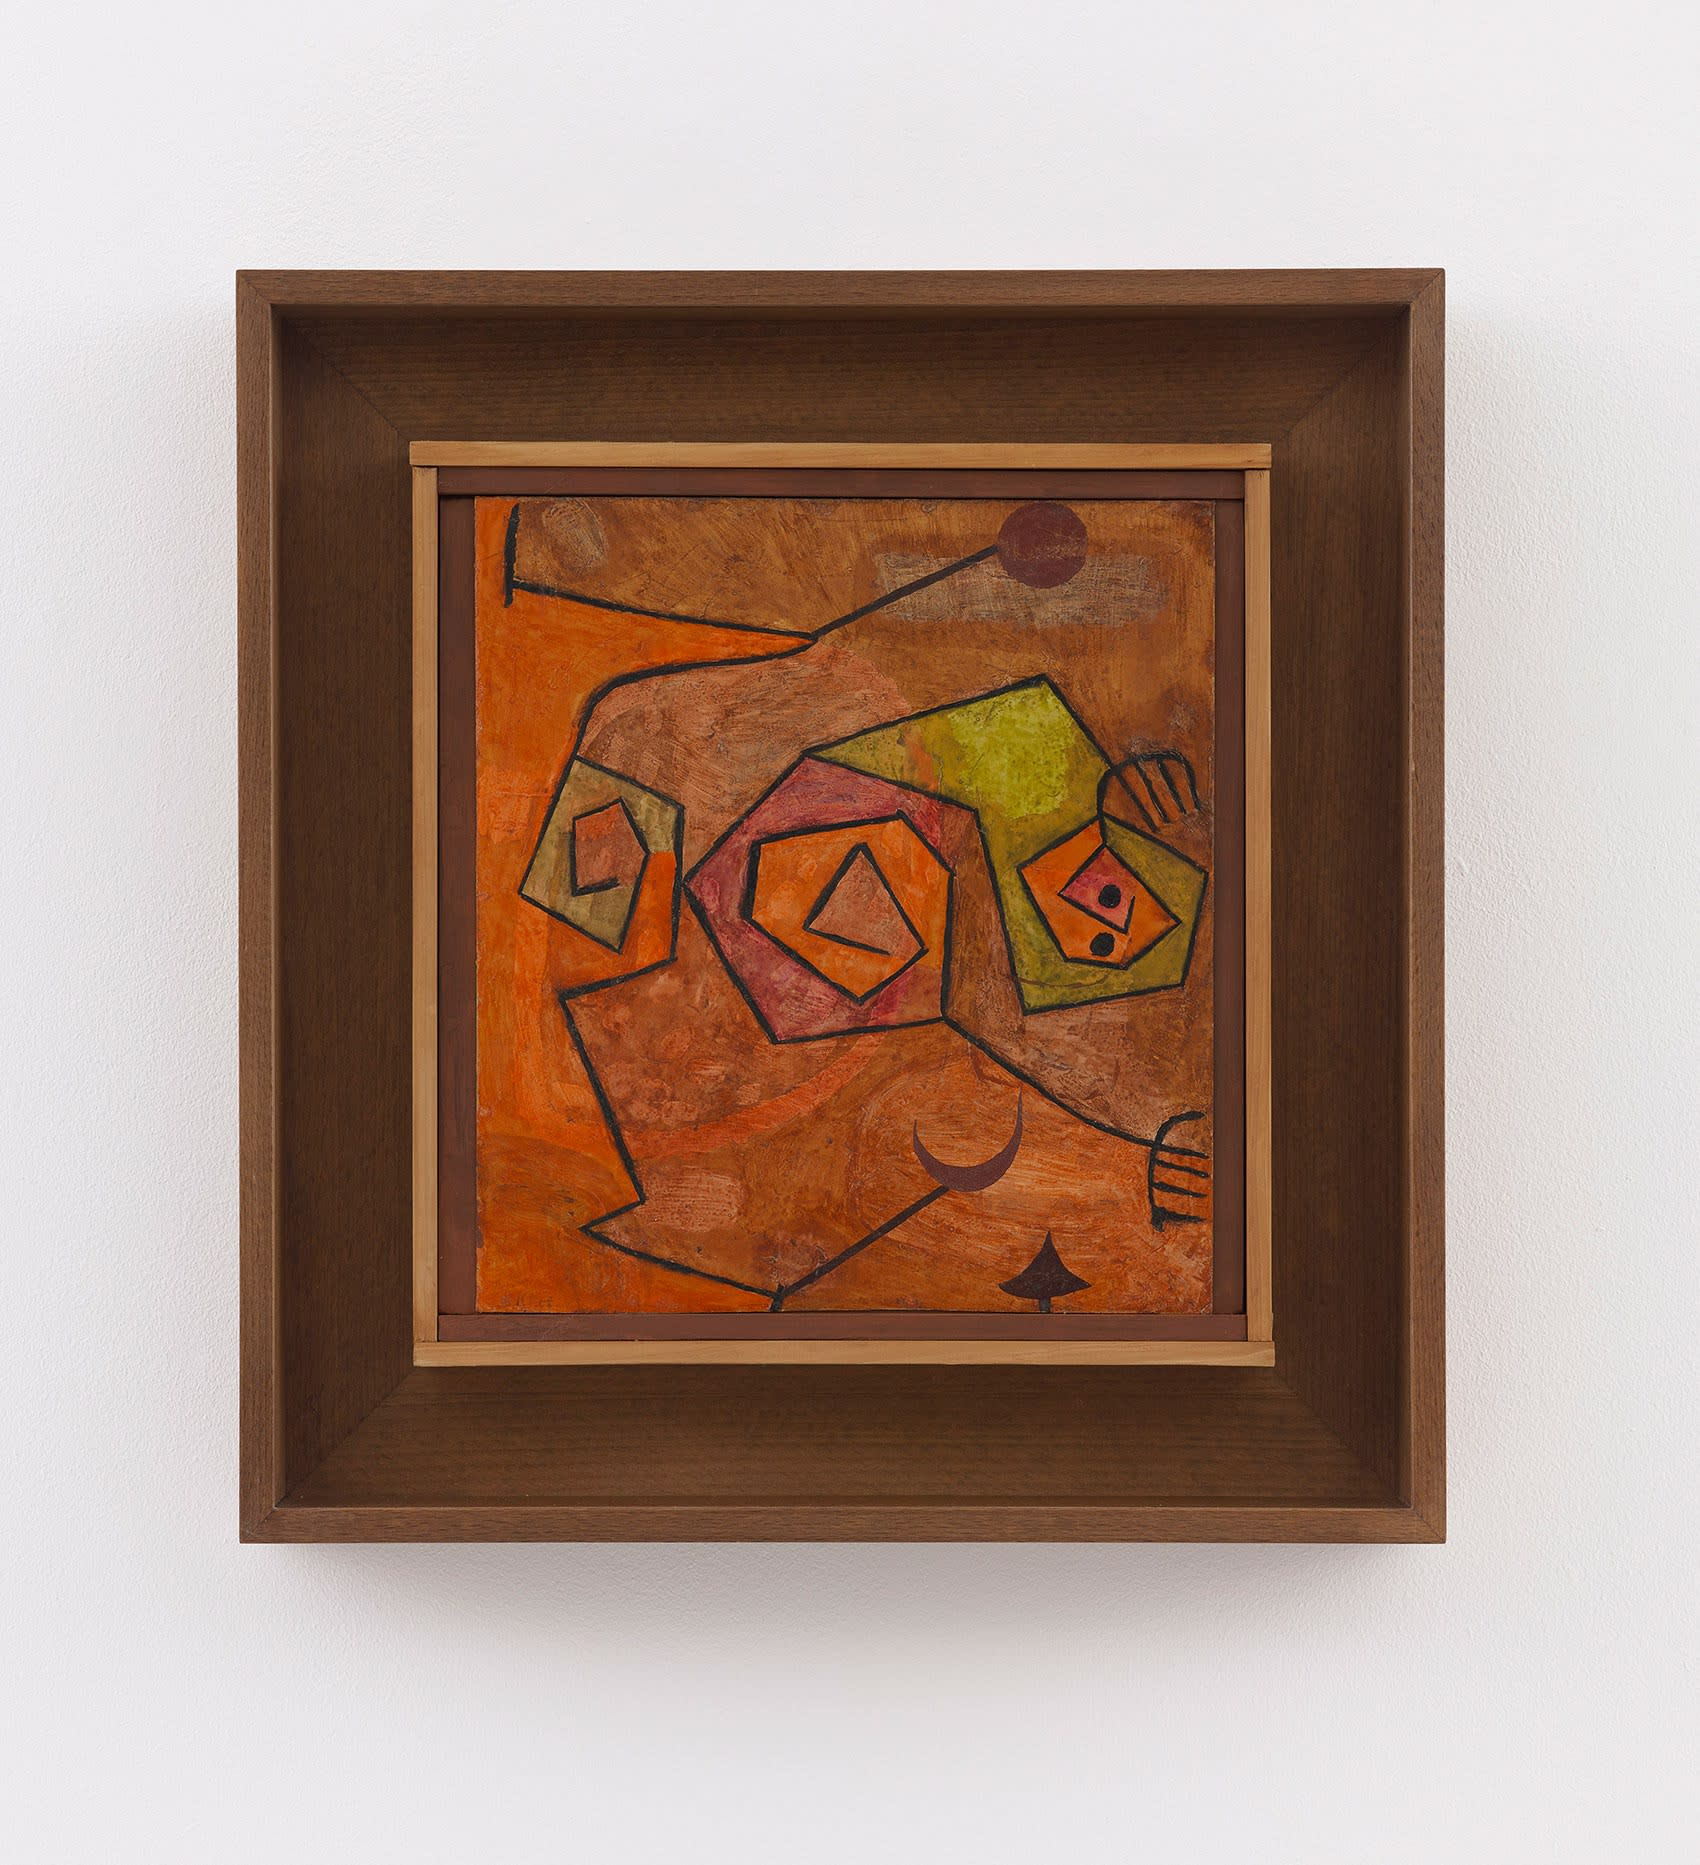 paul klee, folter, torture, 1938, frieze masters, david zwirner gallery